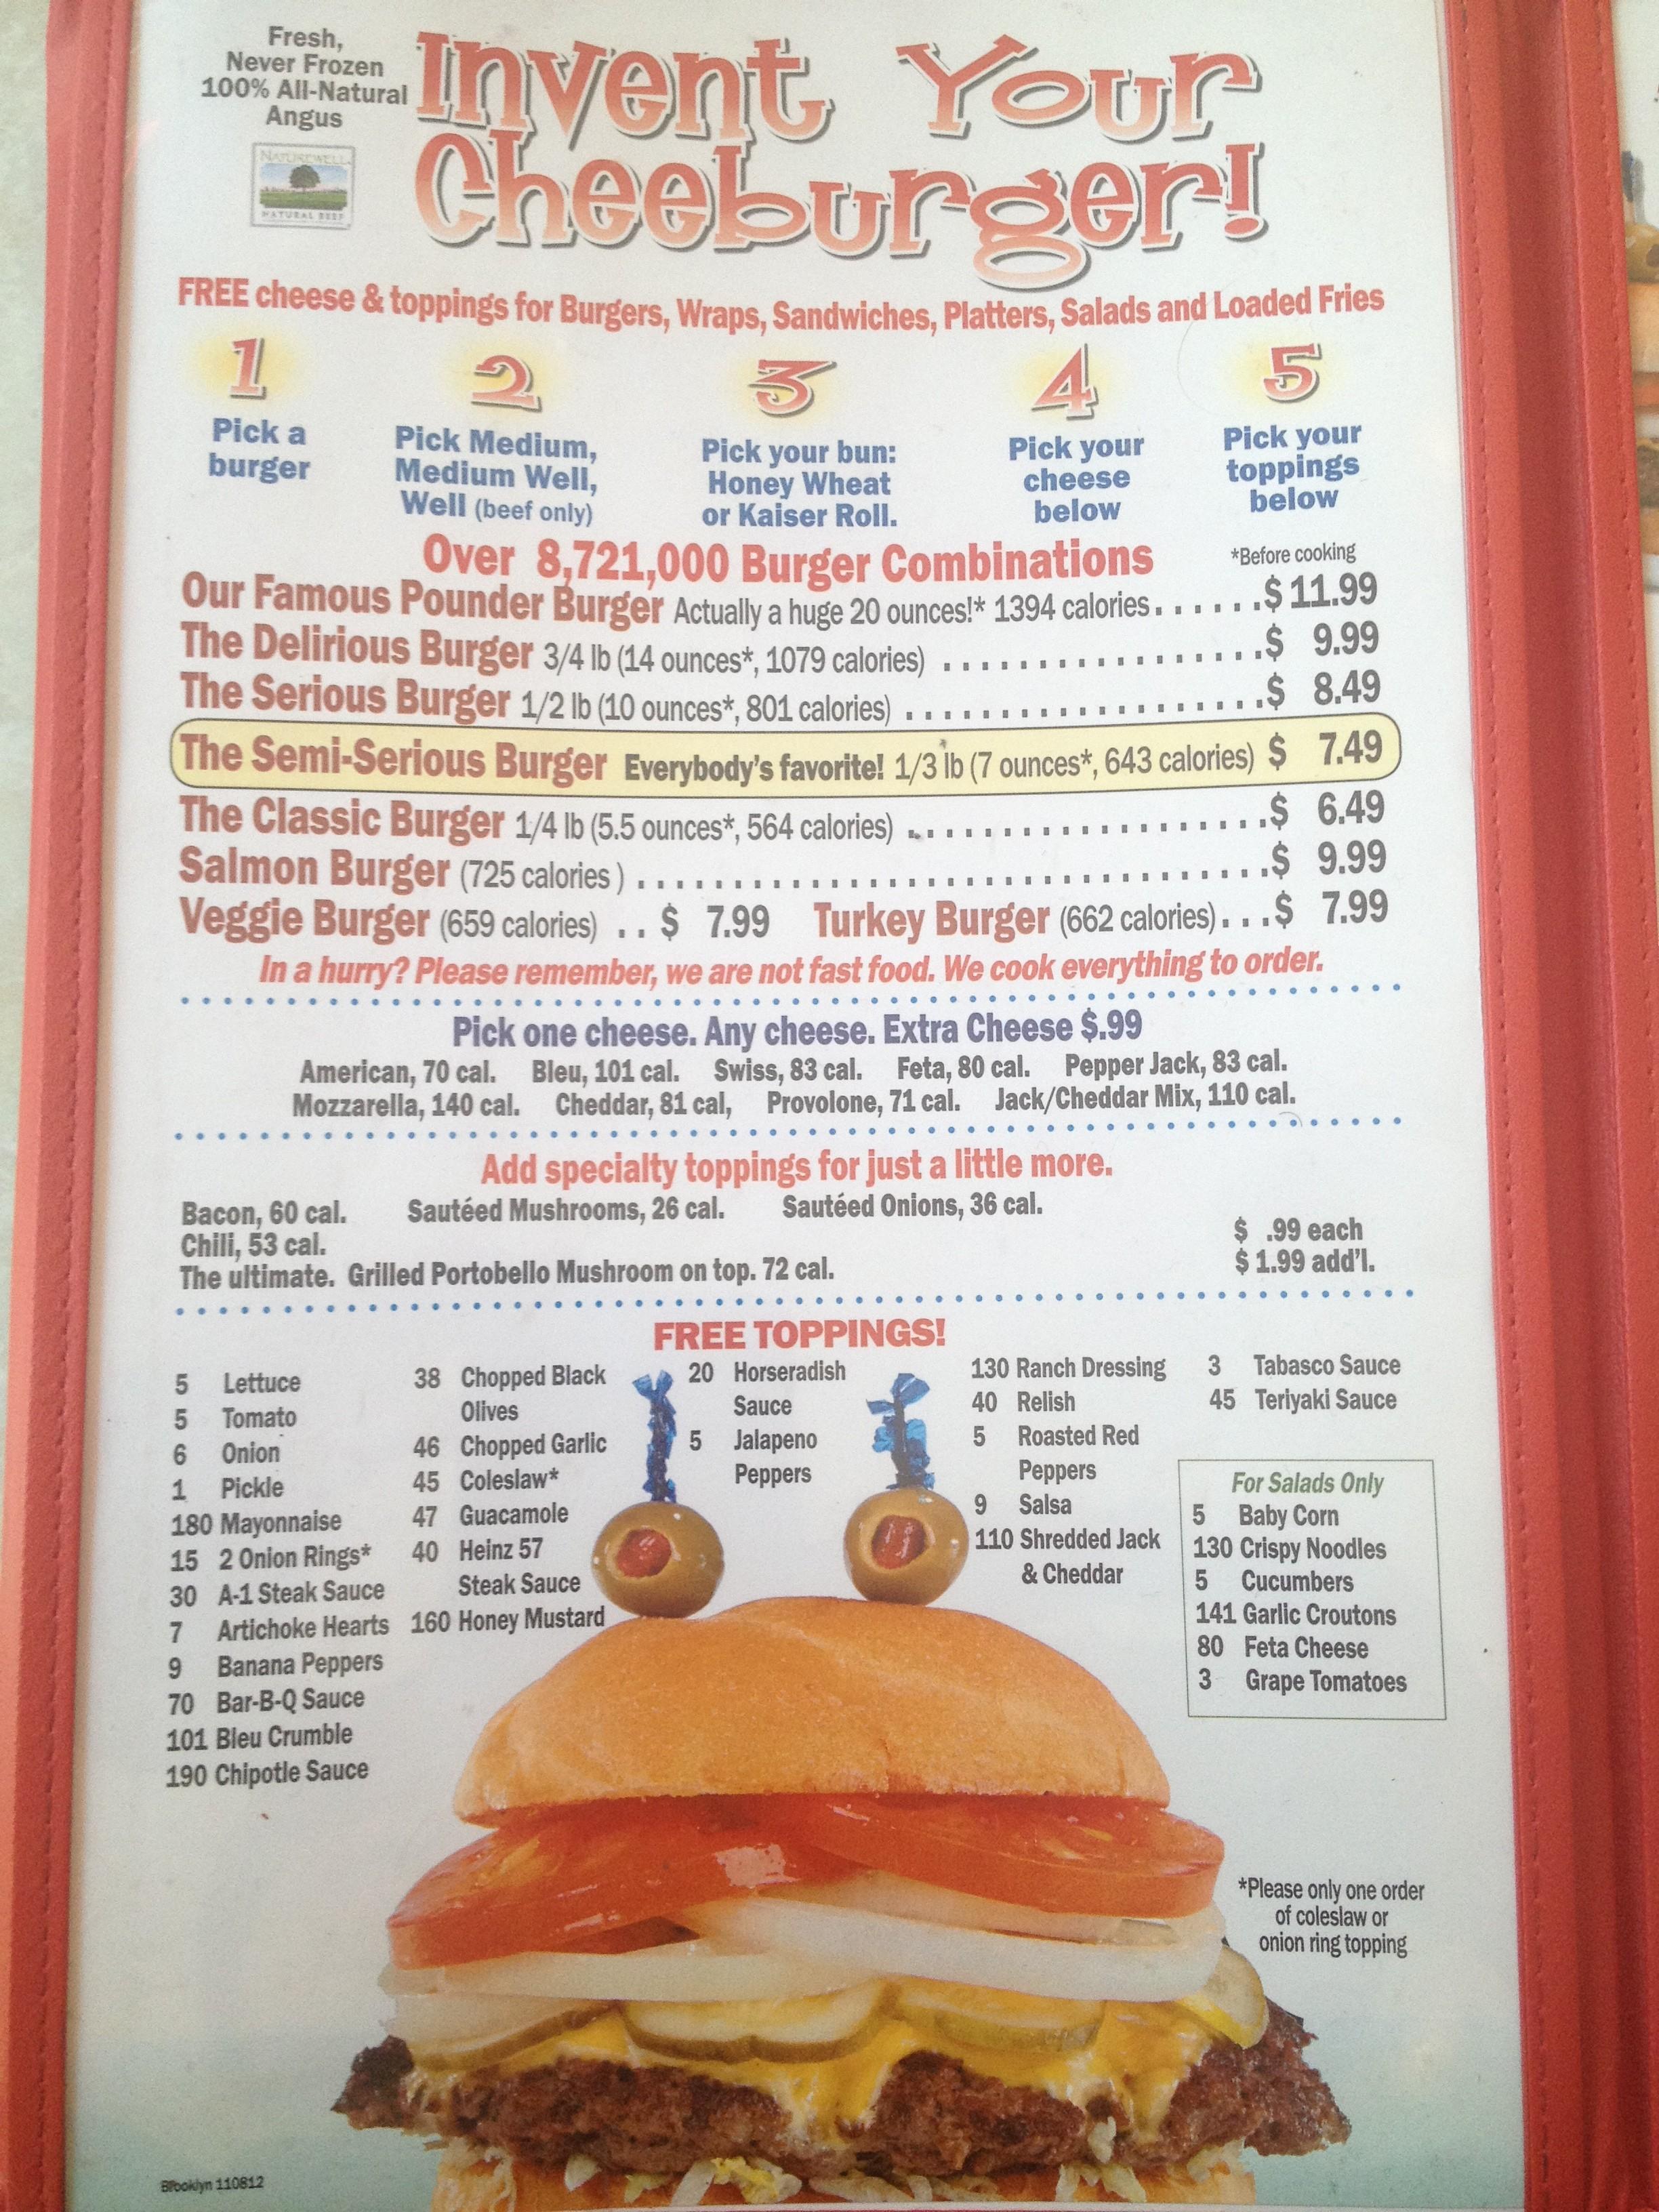 Cheeburger Cheeburger 50s Style Burgers And Flavor Bomb